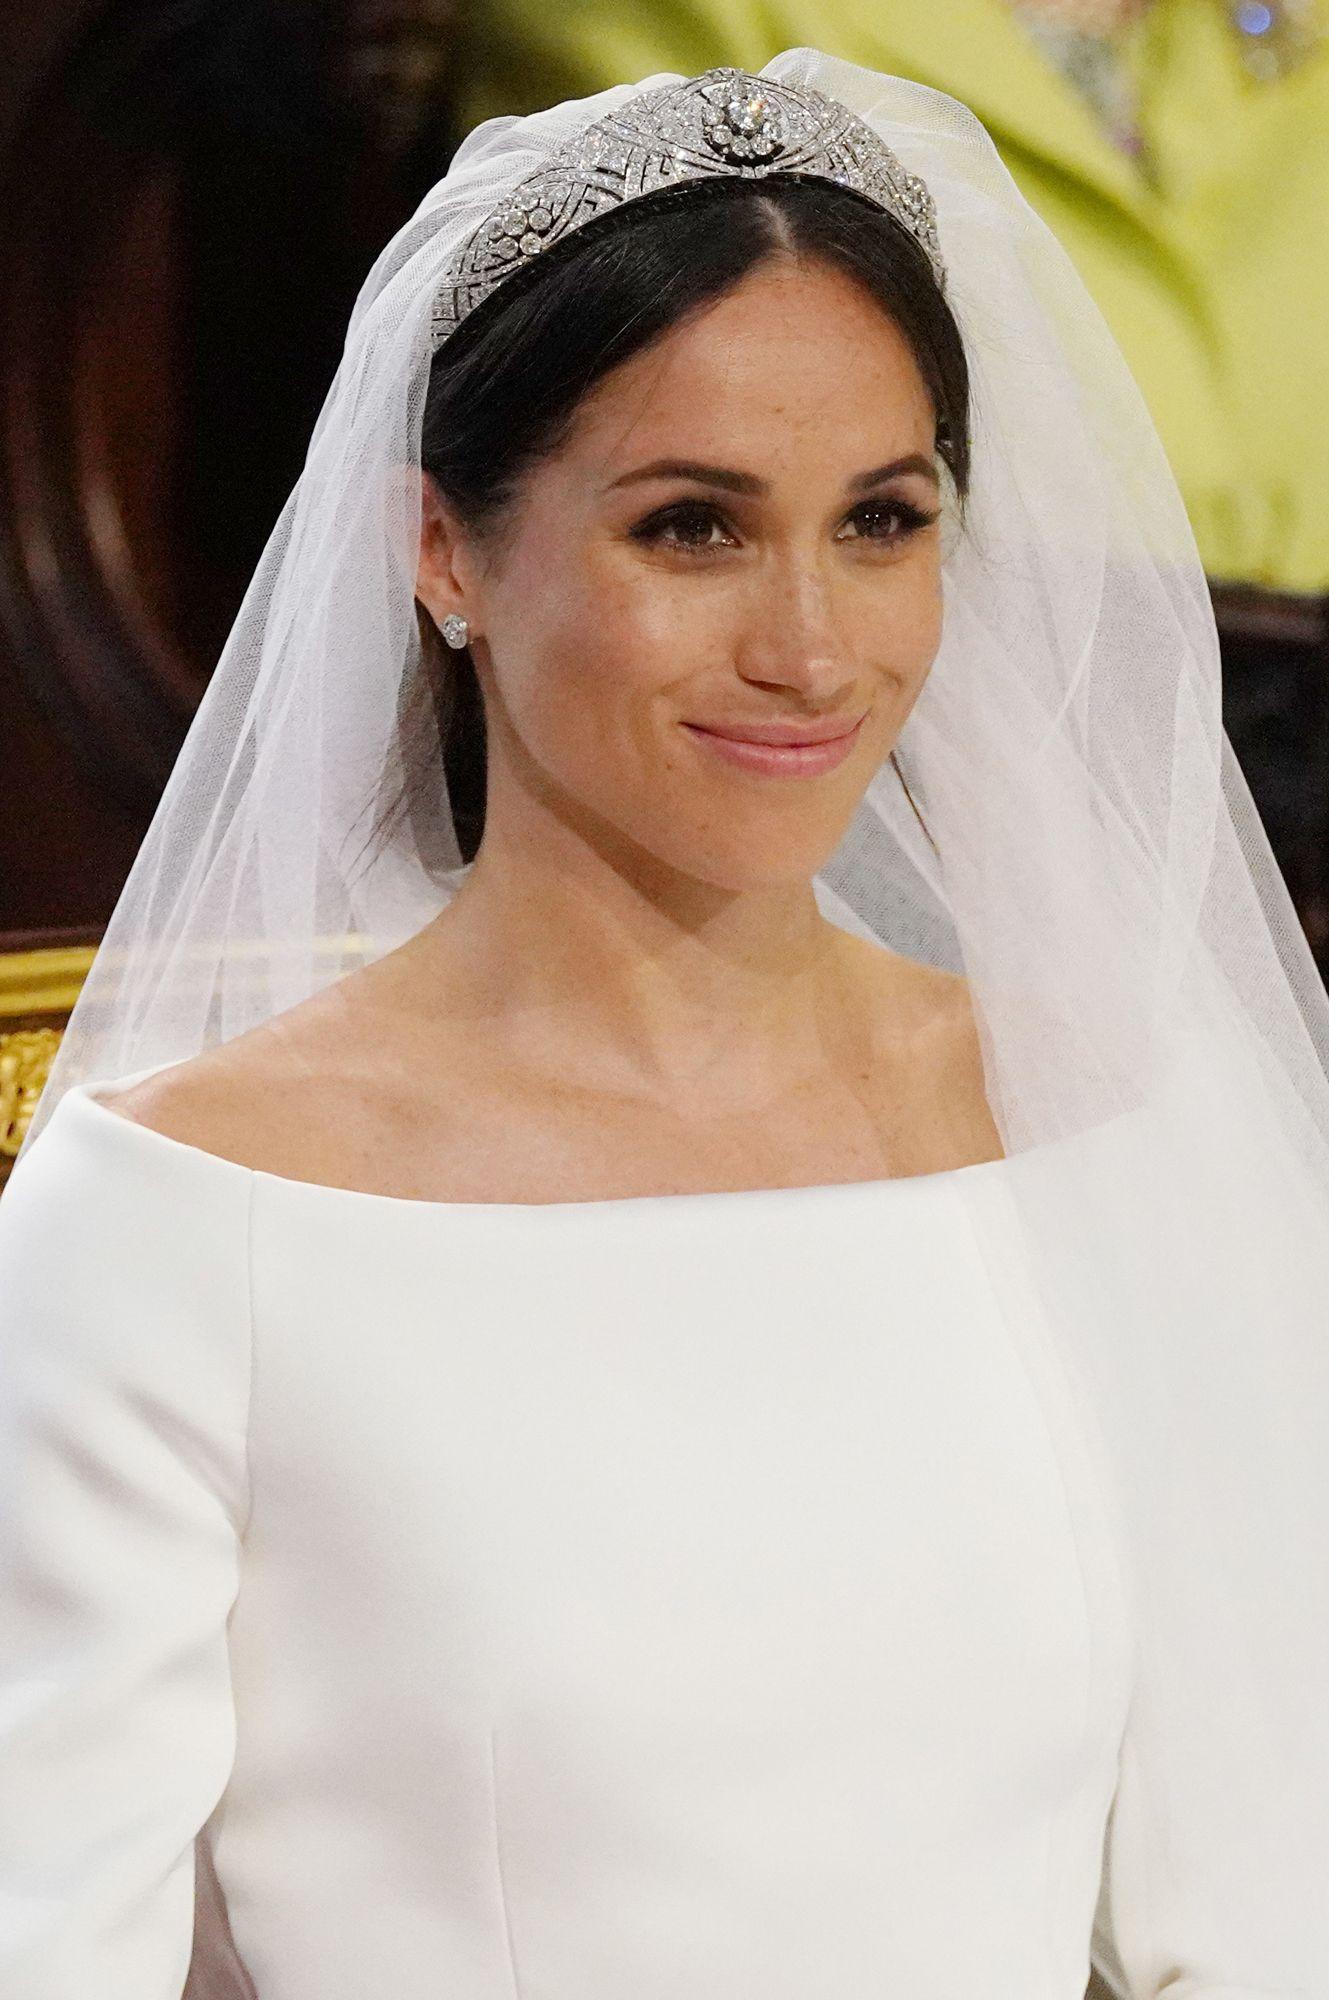 Meghan markleus royal wedding dress is a nod to american royalty